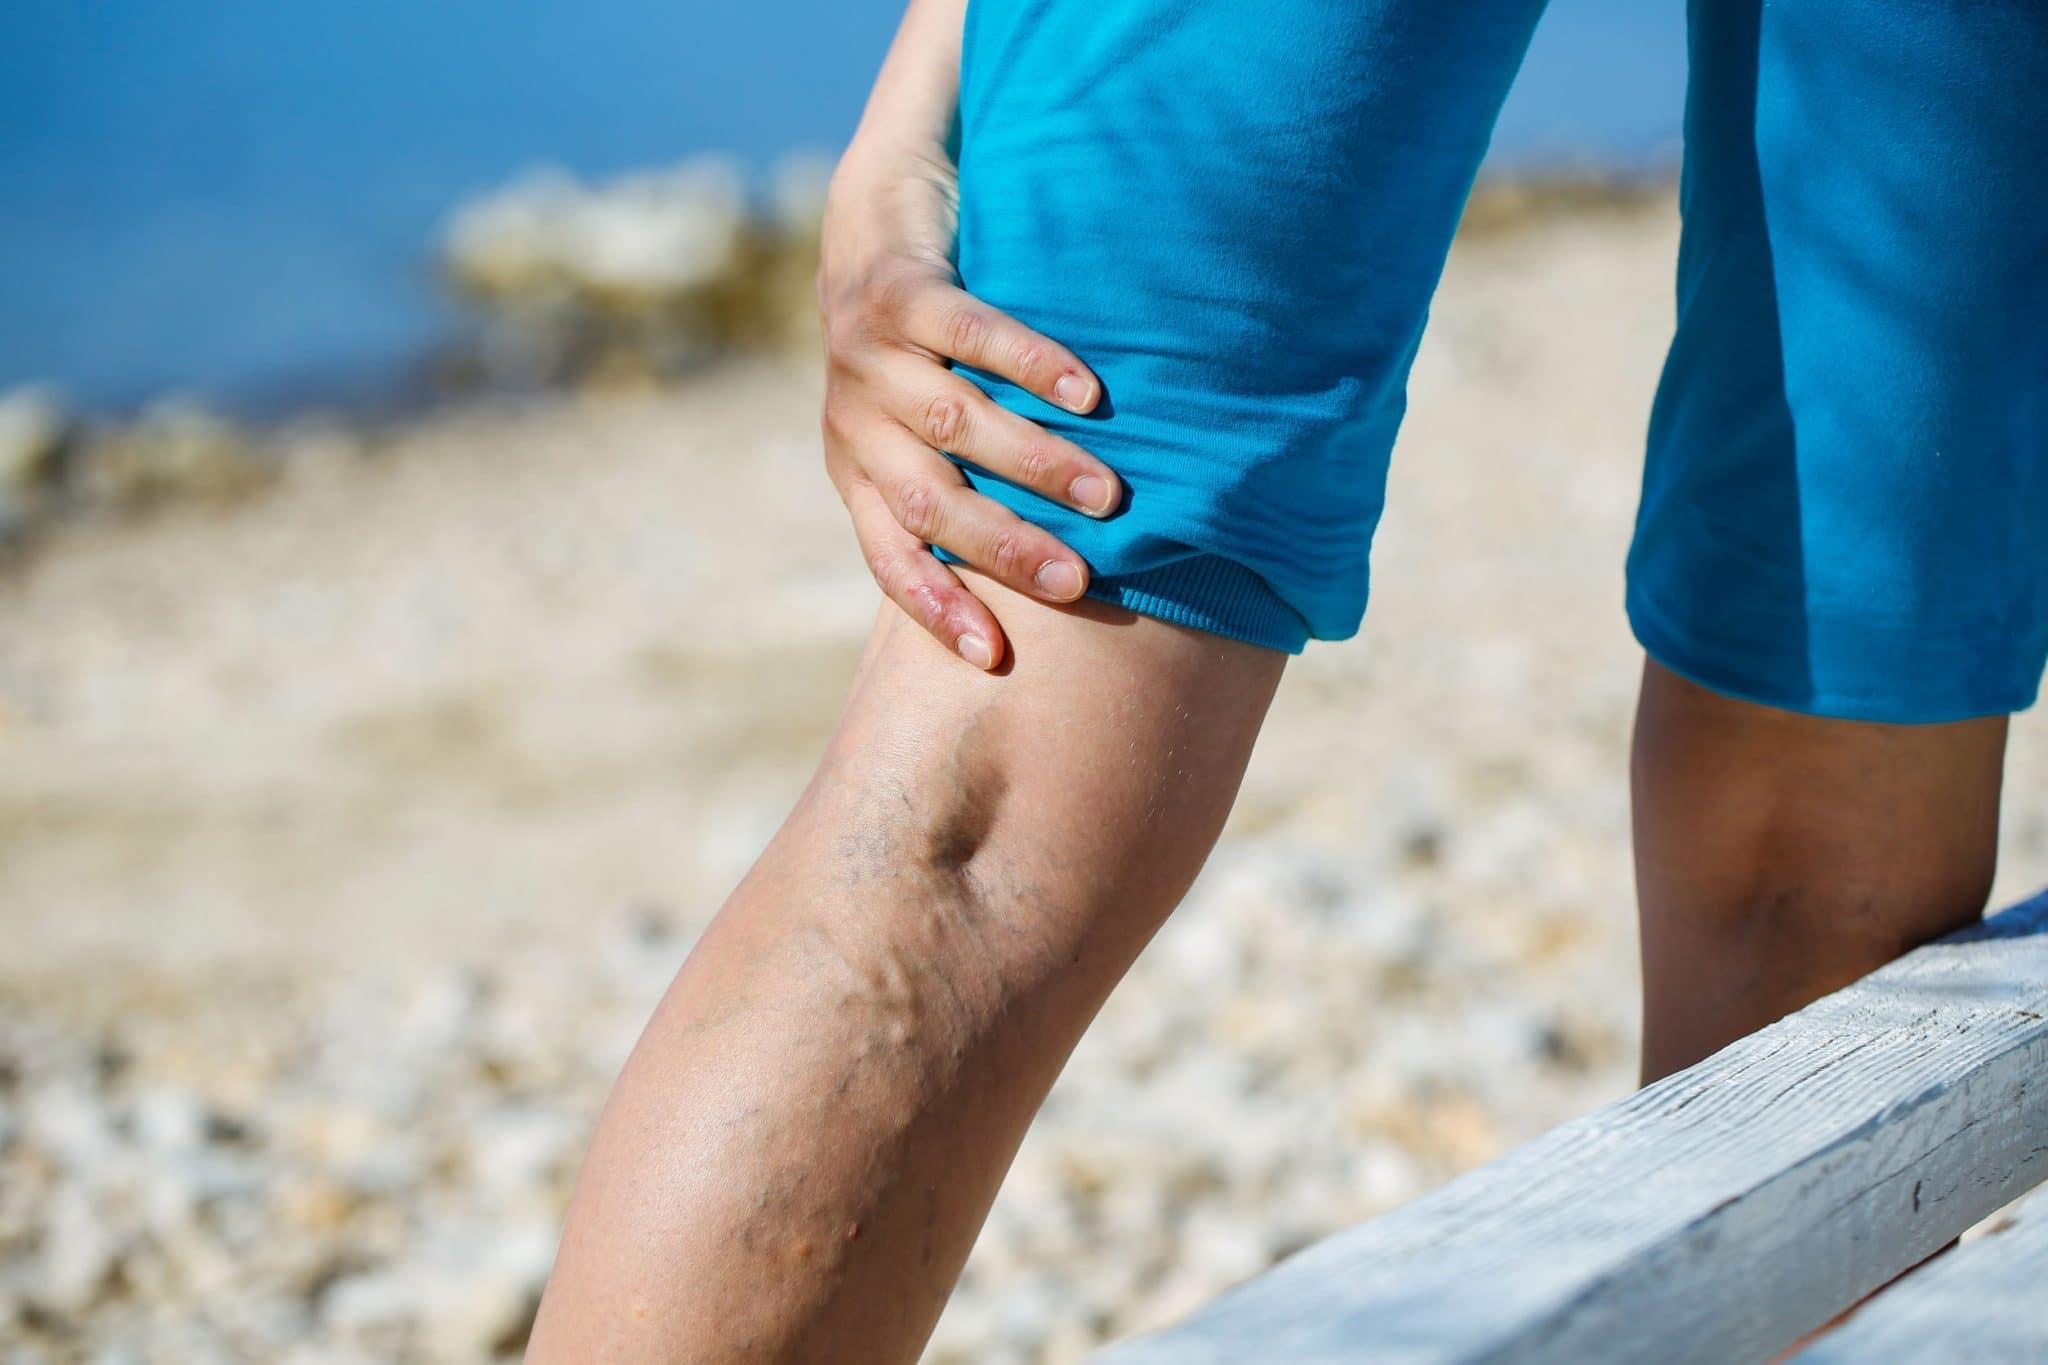 Painful varicose veins